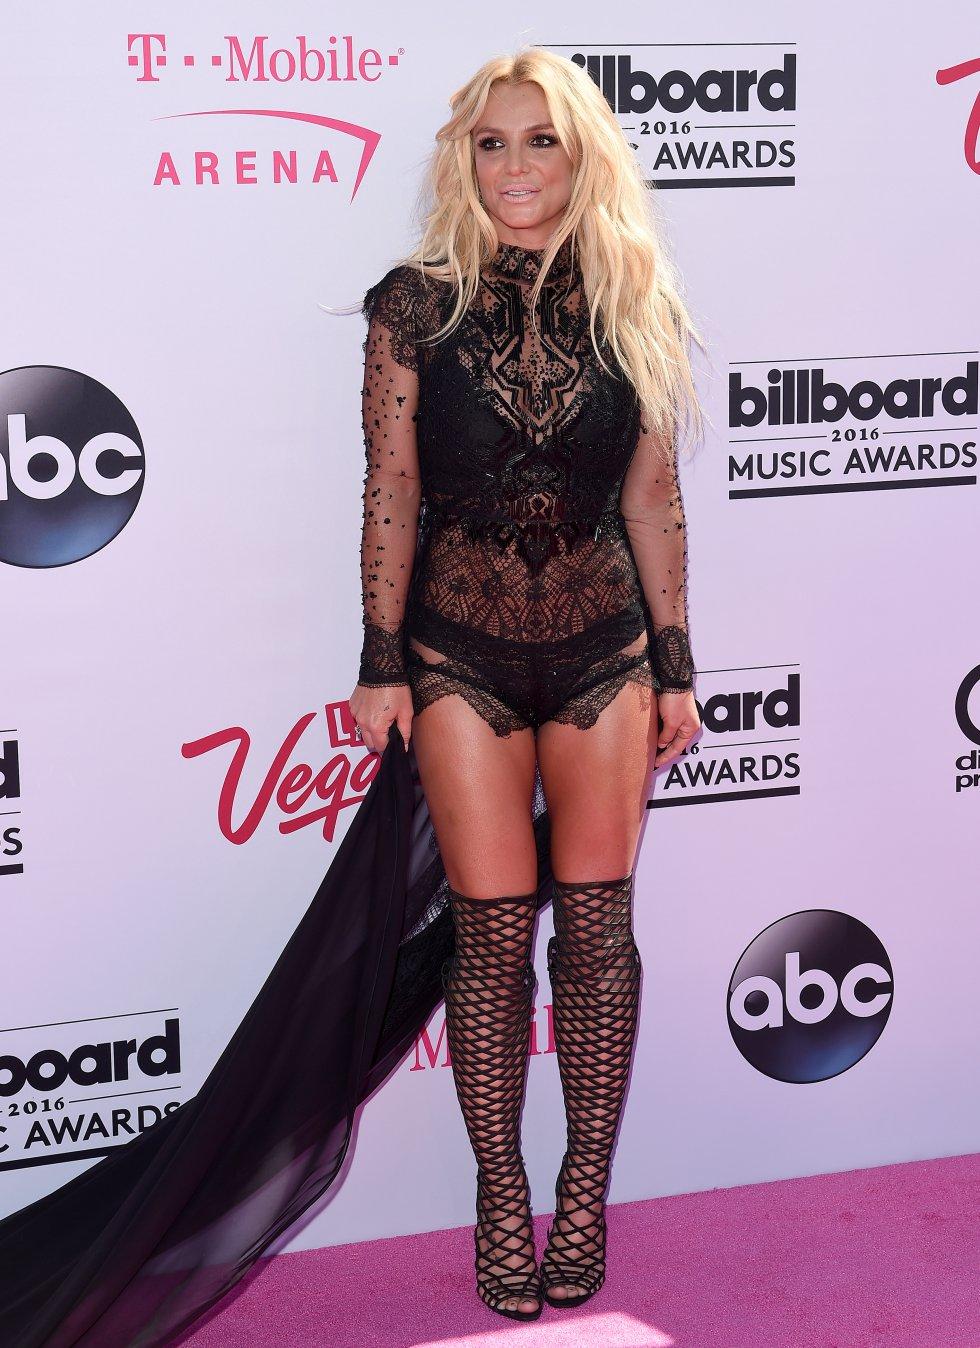 2016 Billboard Music Awards.